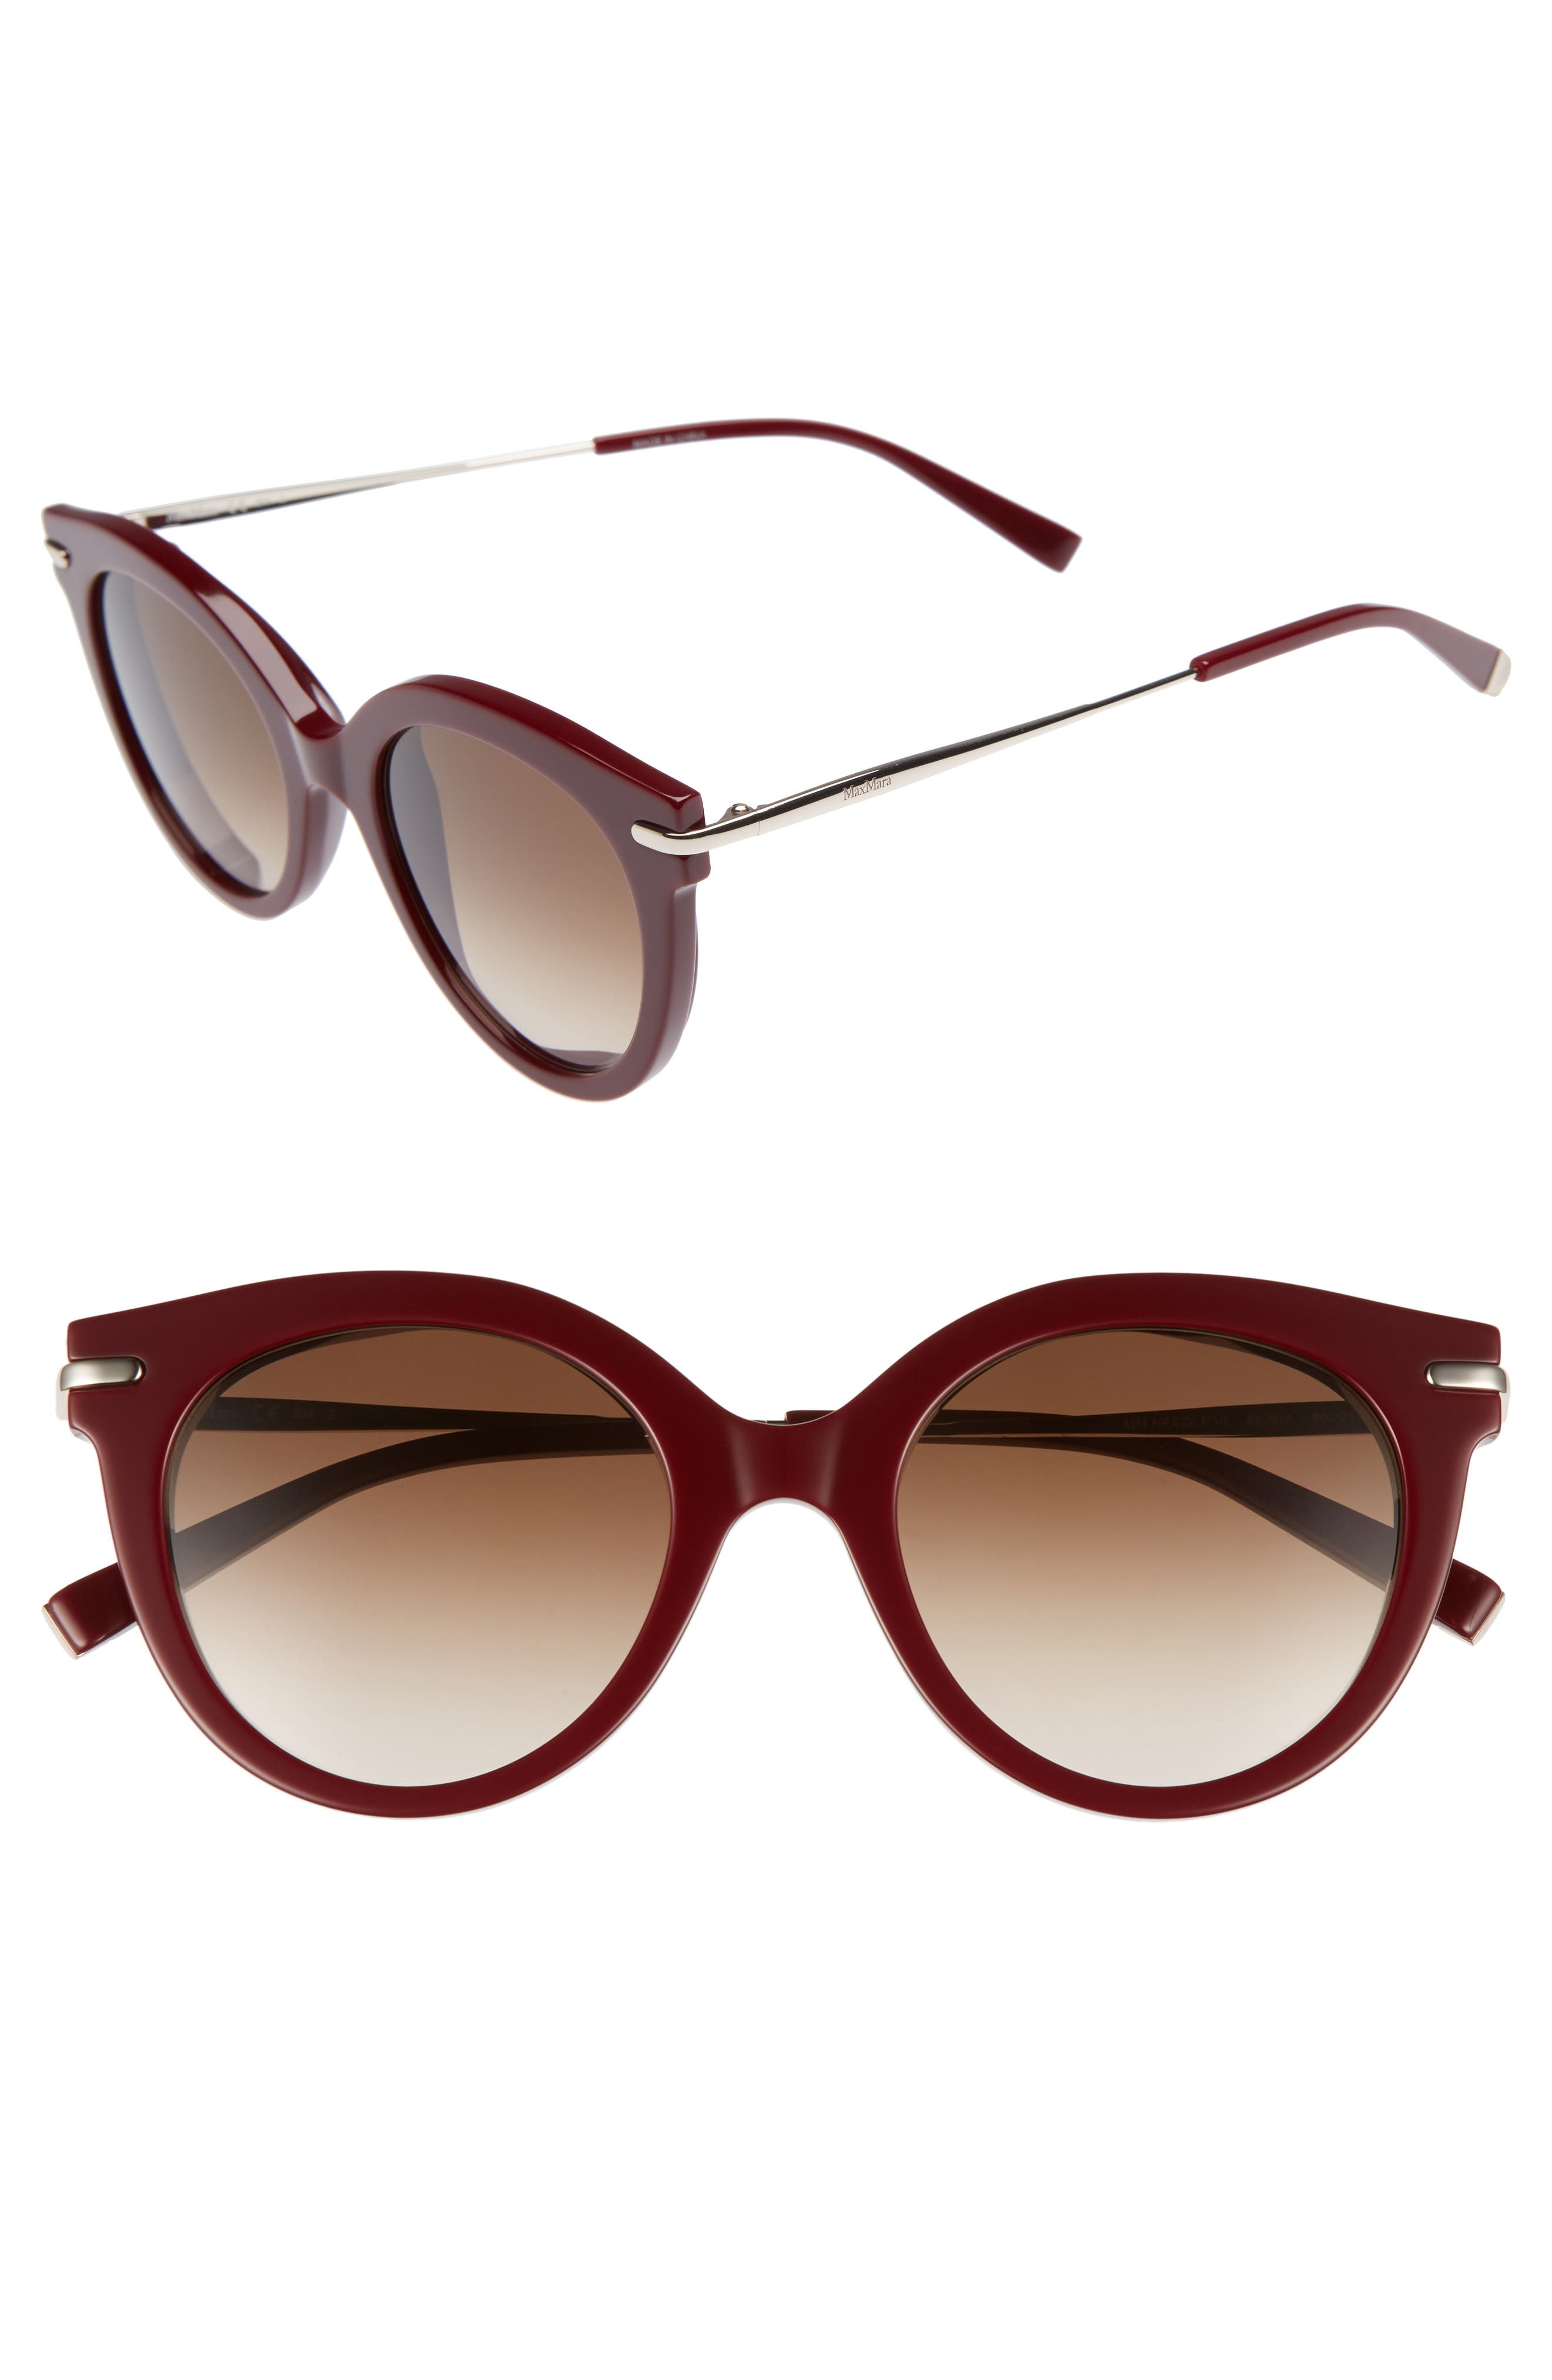 Needle VI 50mm Gradient Round Sunglasses,                             Main thumbnail 1, color,                             BURGUNDY GOLD